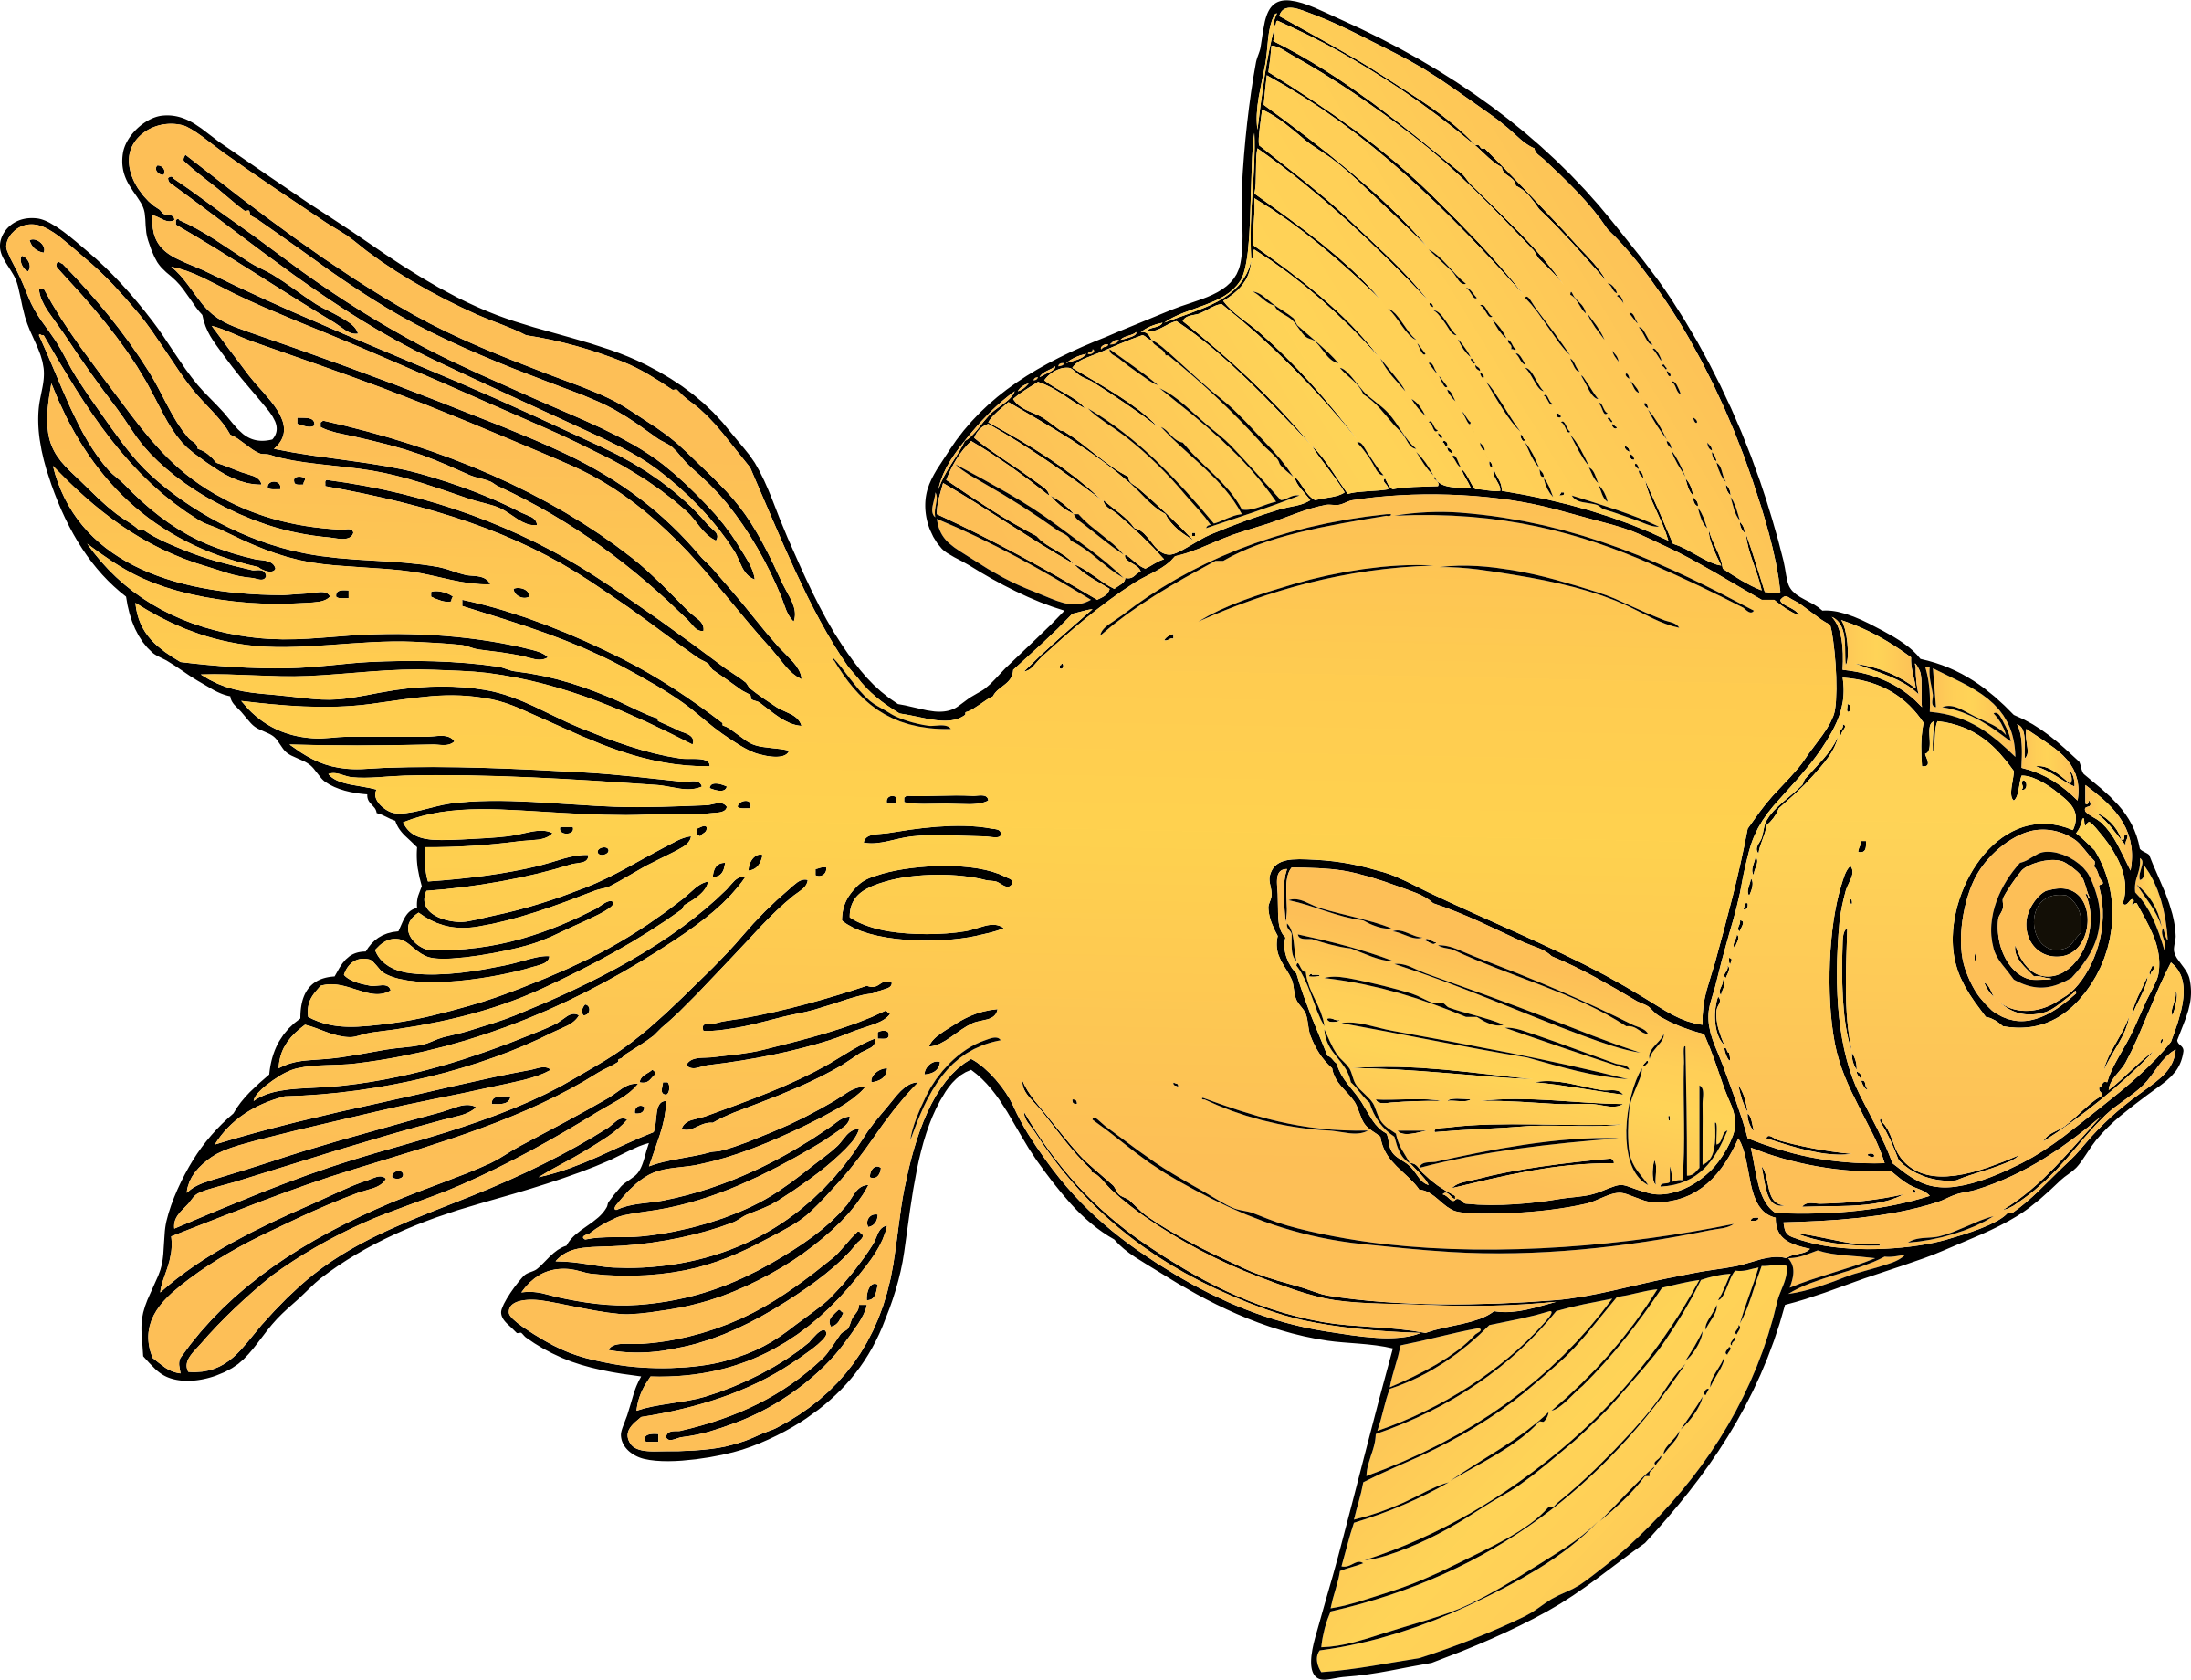 Goldfish objects